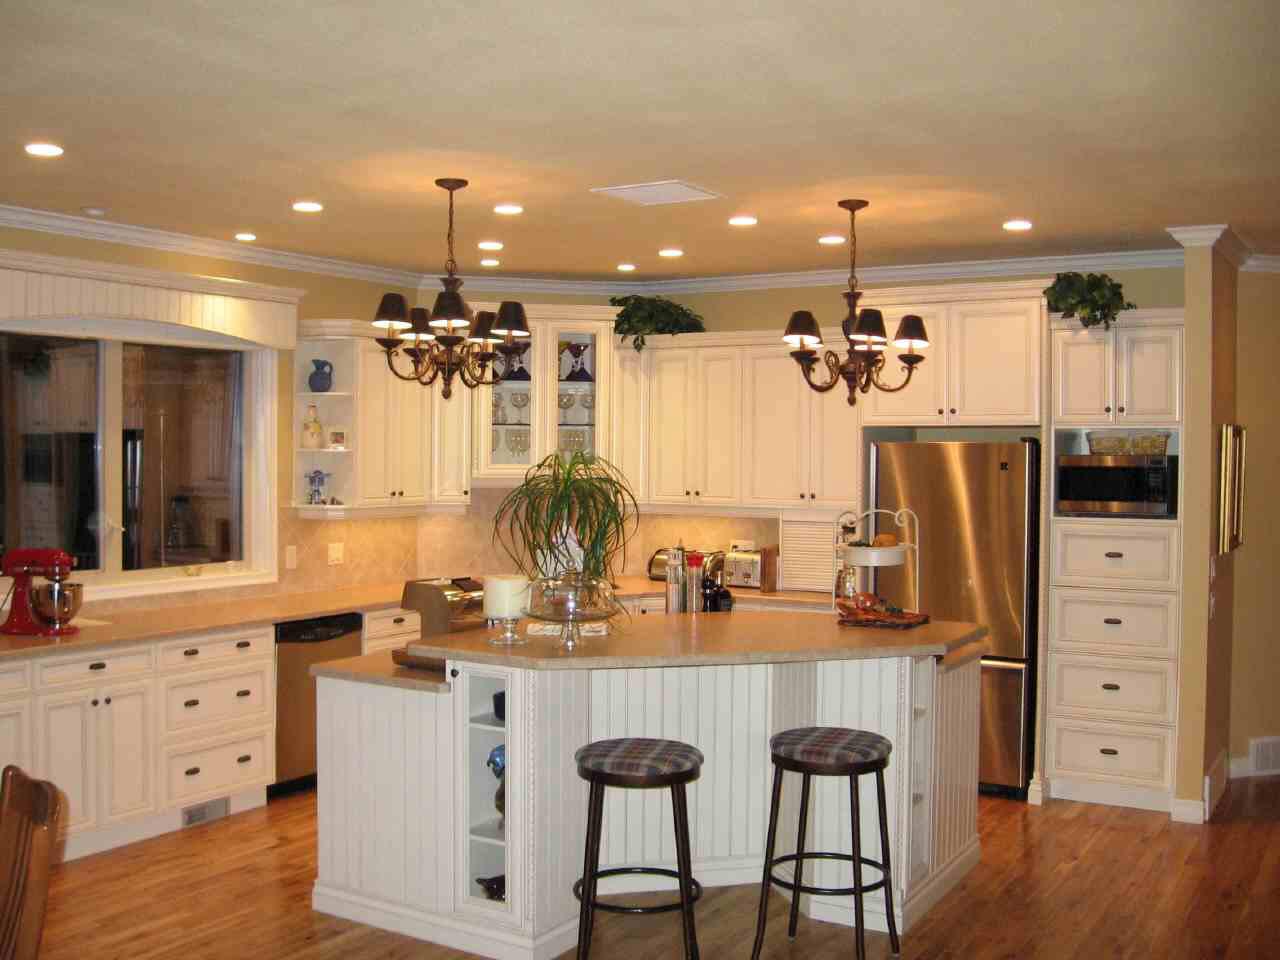 Coffee wall decor kitchen photo - 3